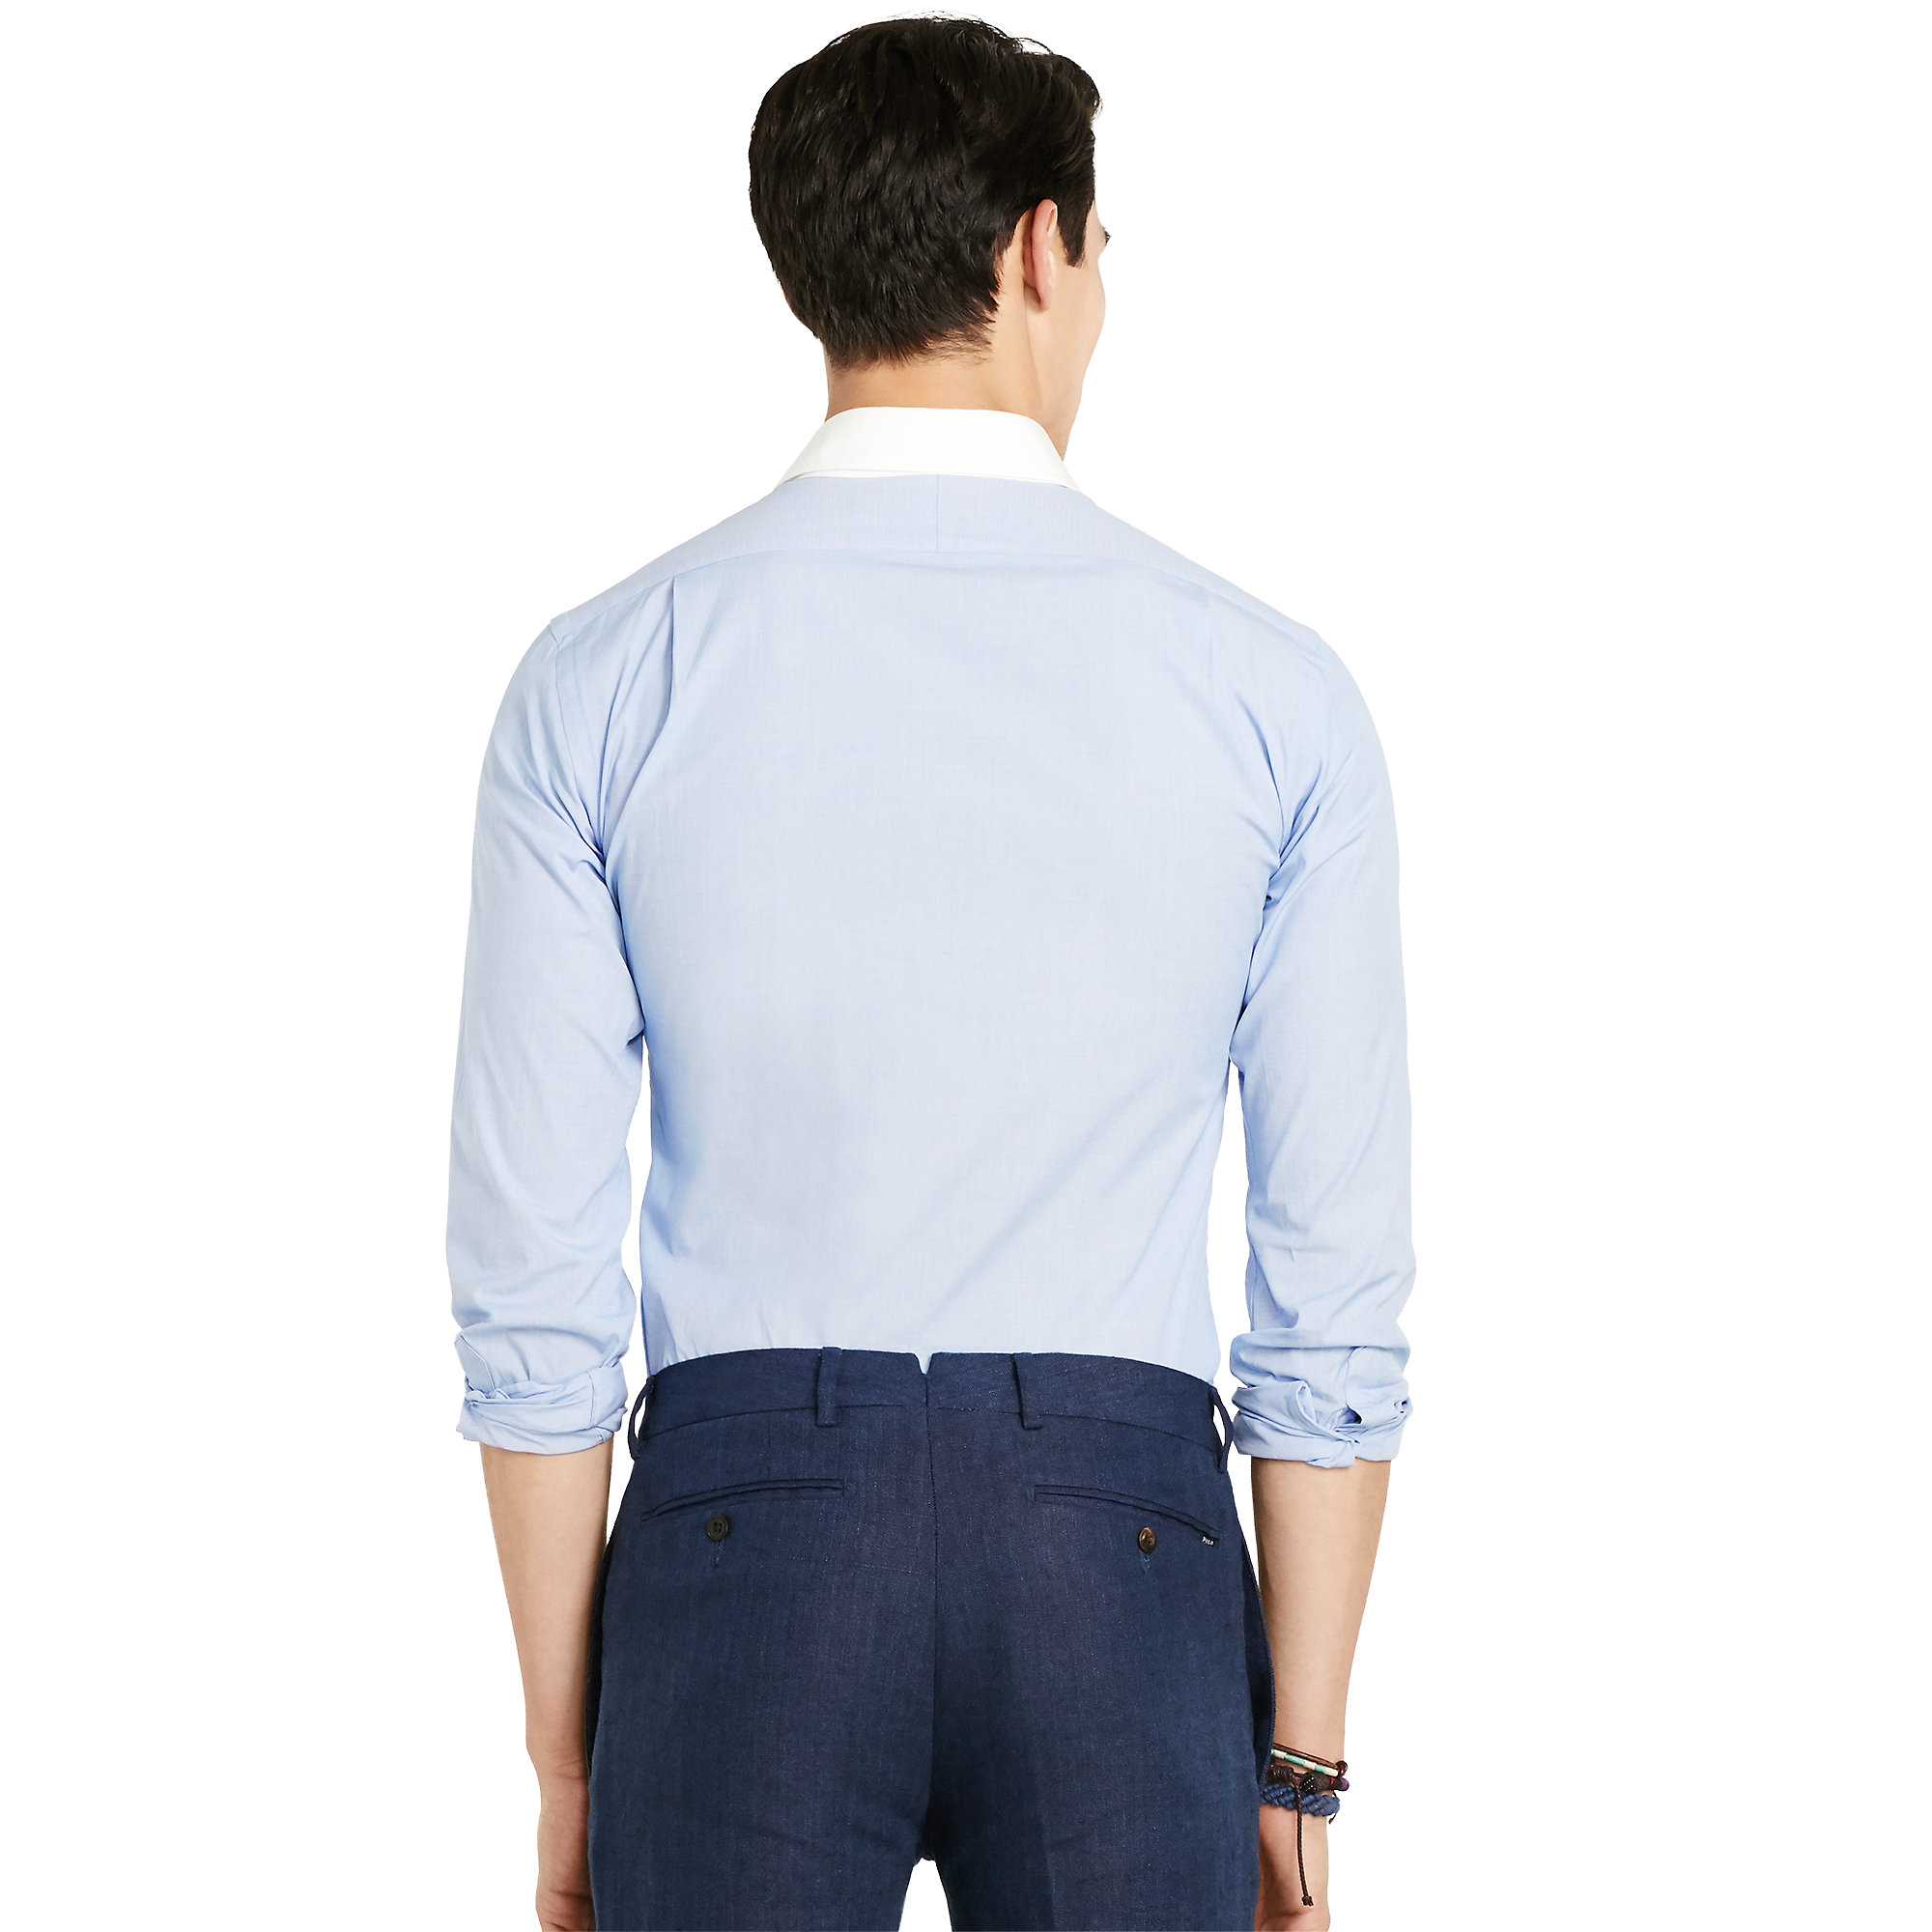 Polo ralph lauren slim stretch club shirt in blue for men for Ralph lauren polo club shirts